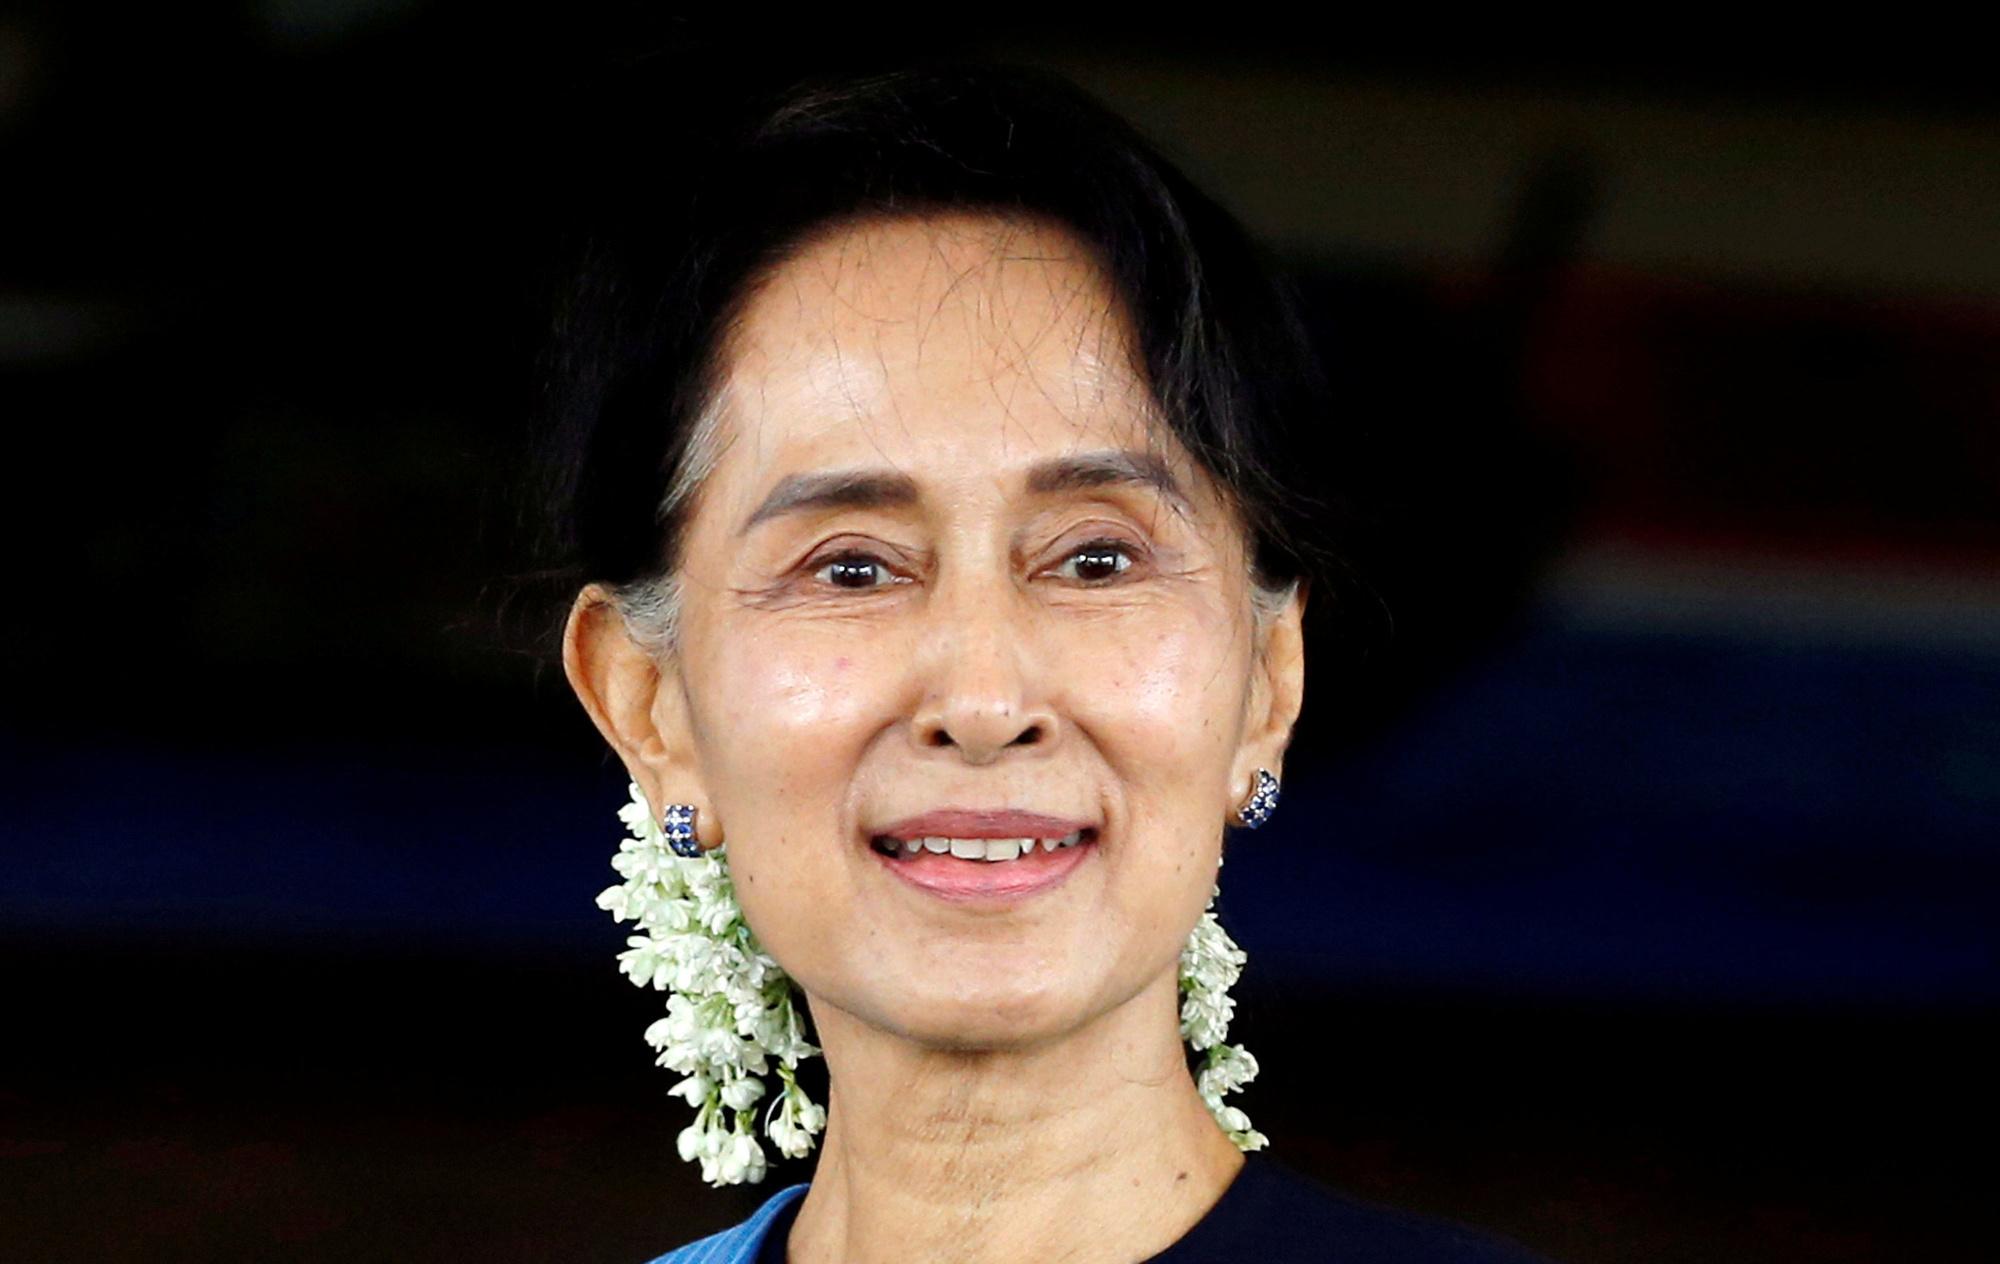 Aung San Suu Kyi, Reuters